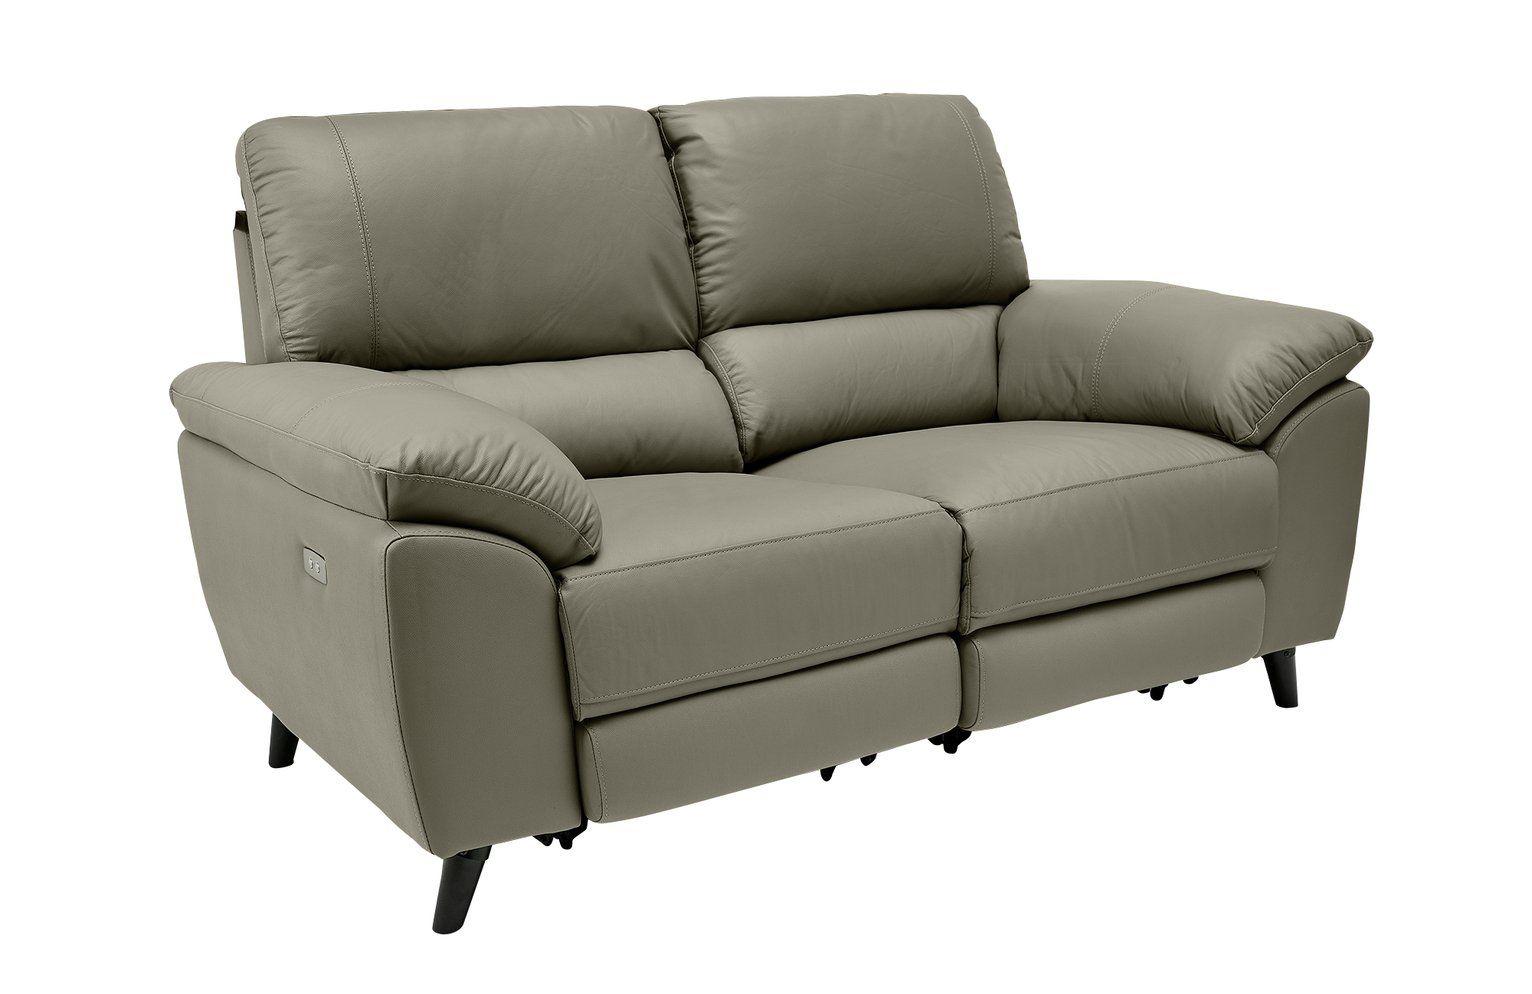 Argos Home Elliot Leather Mix 2 Seater Recliner Sofa Grey In 2020 Reclining Sofa Gray Sofa Recliner